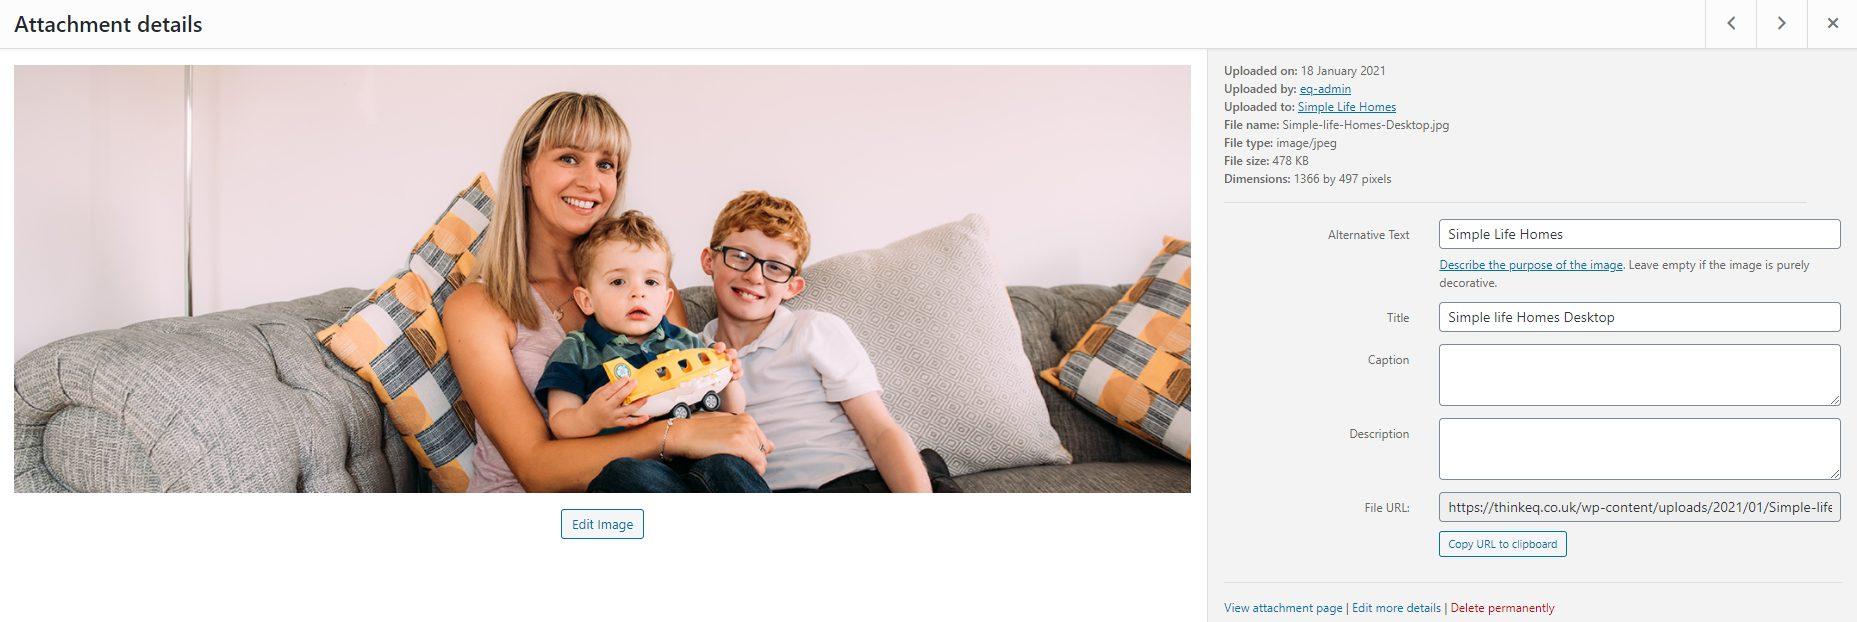 WordPress Media Library Image Editing